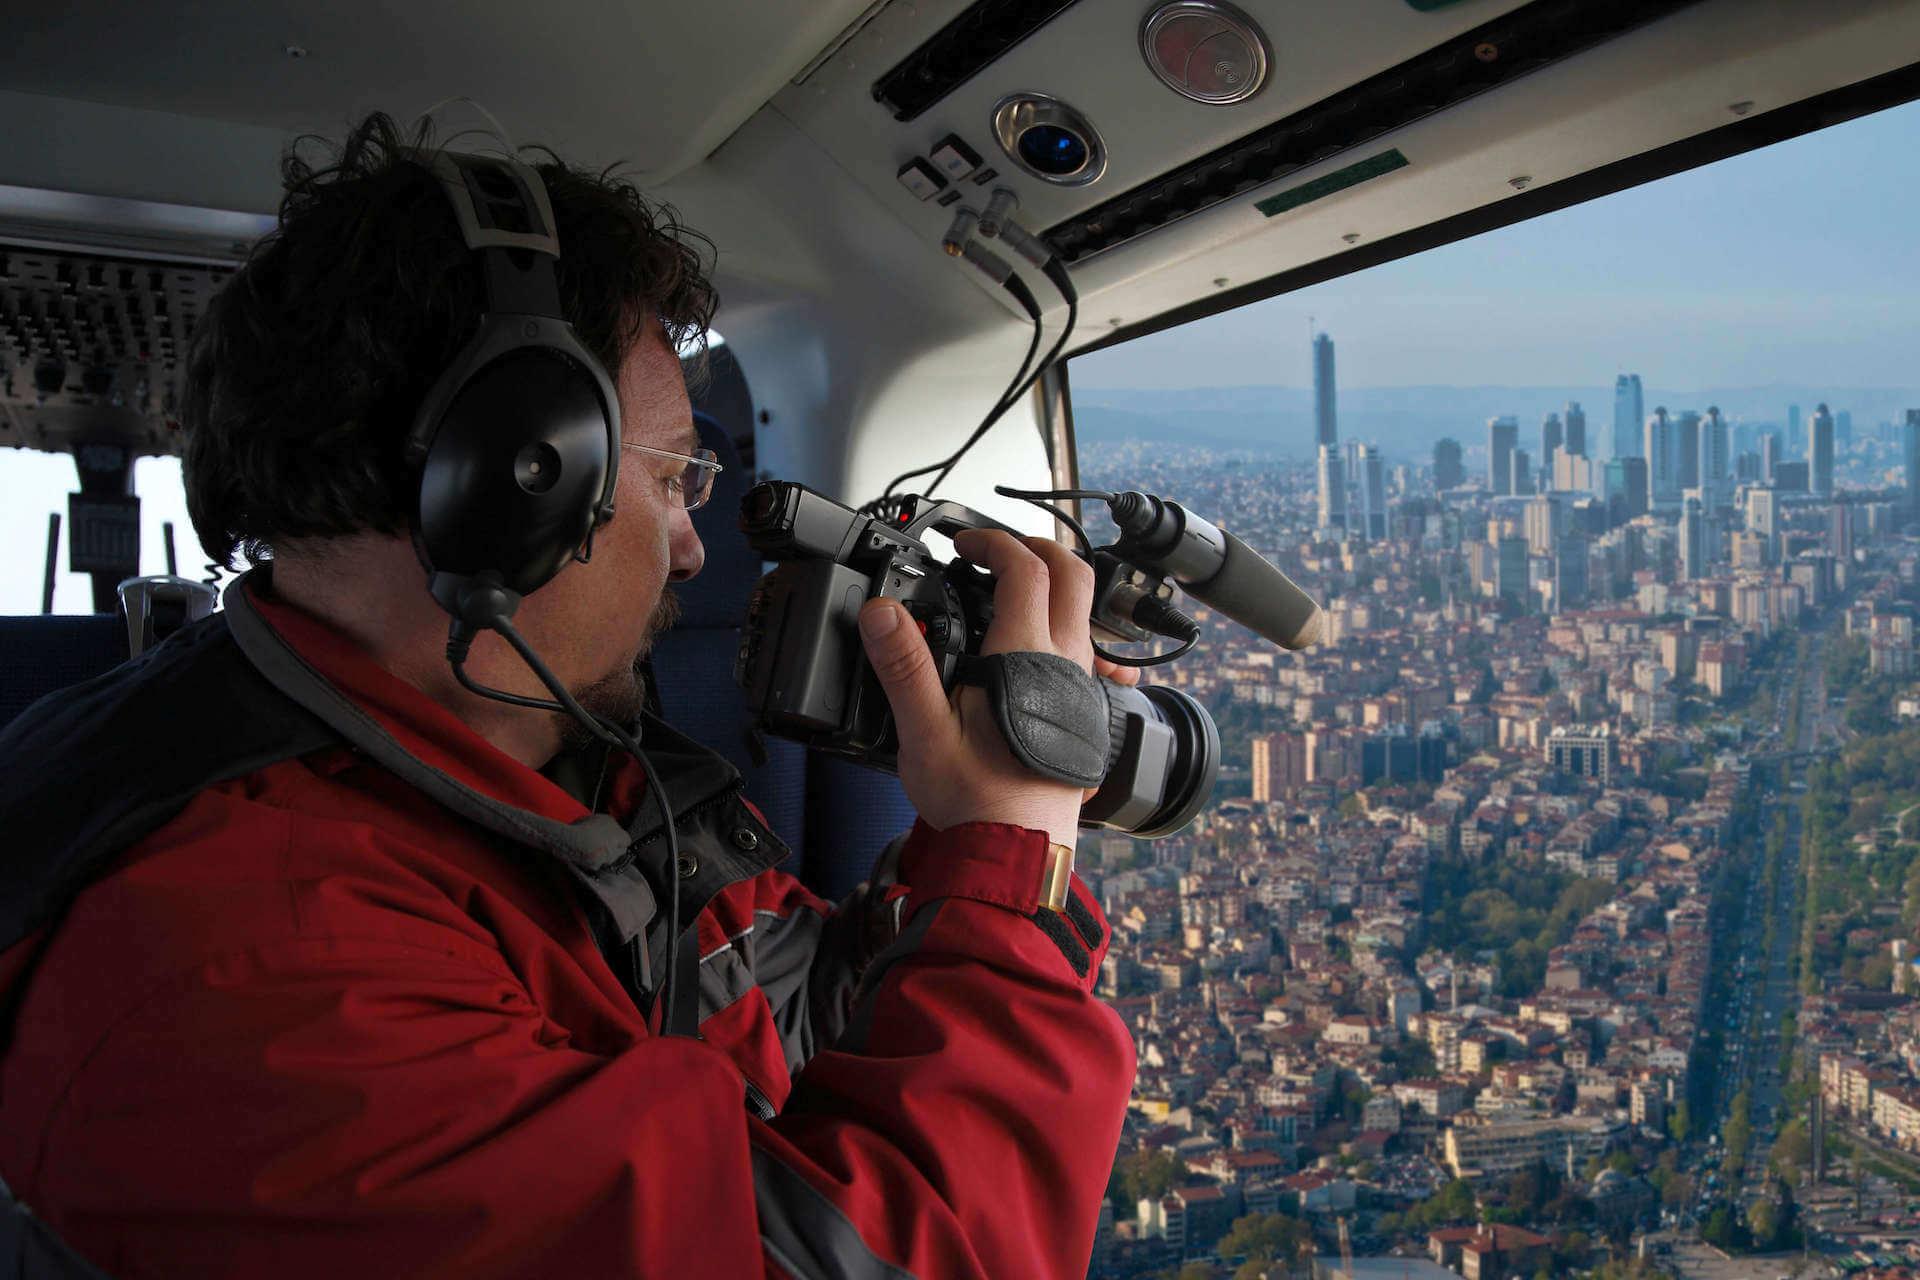 Virtuosa_Cameraman&helicopter